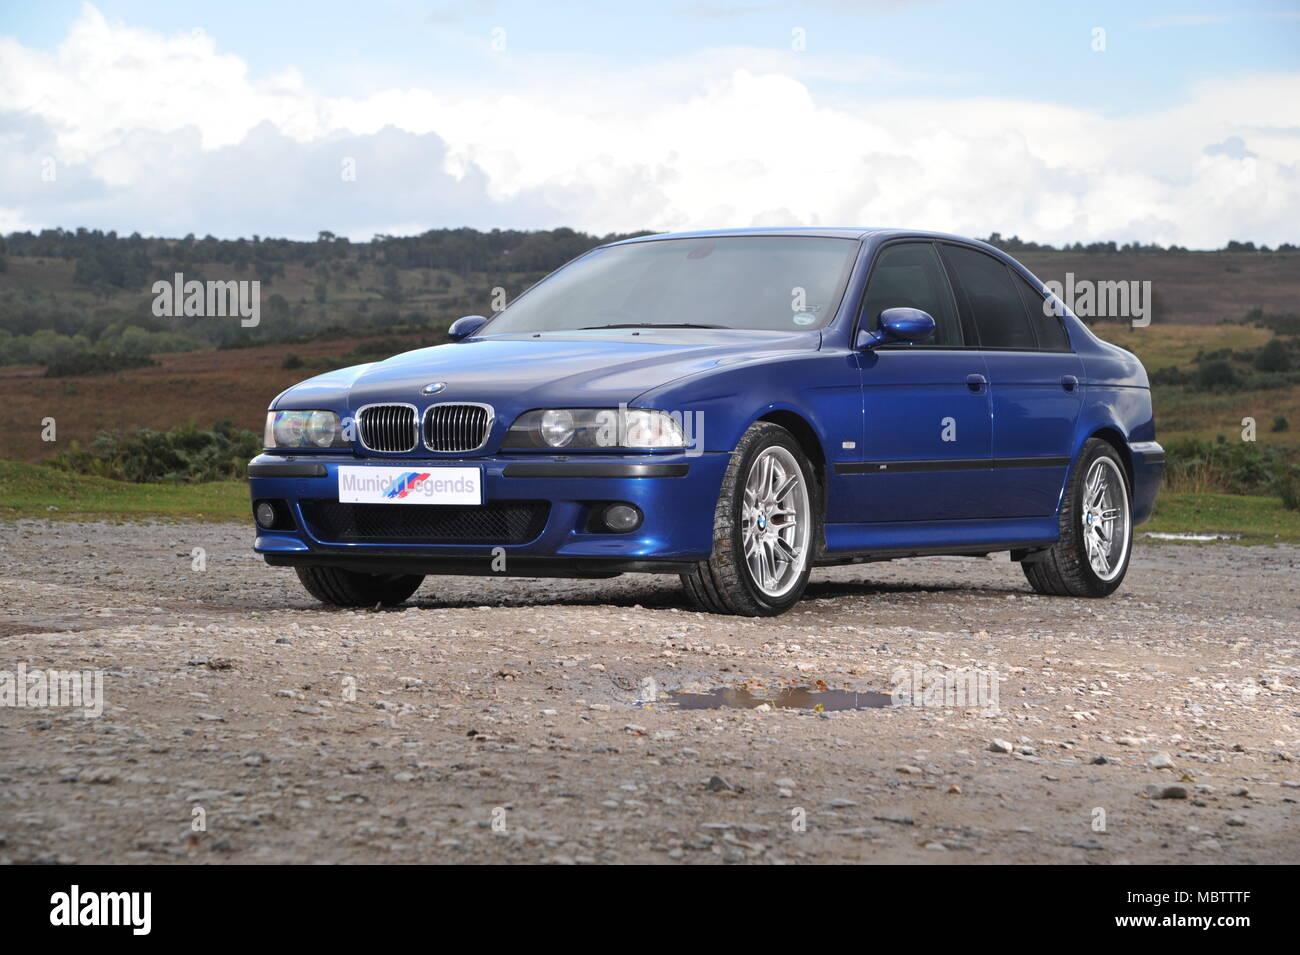 BMW M5 E39 (1996 2003) Shape German Super Saloon Car   Stock Image